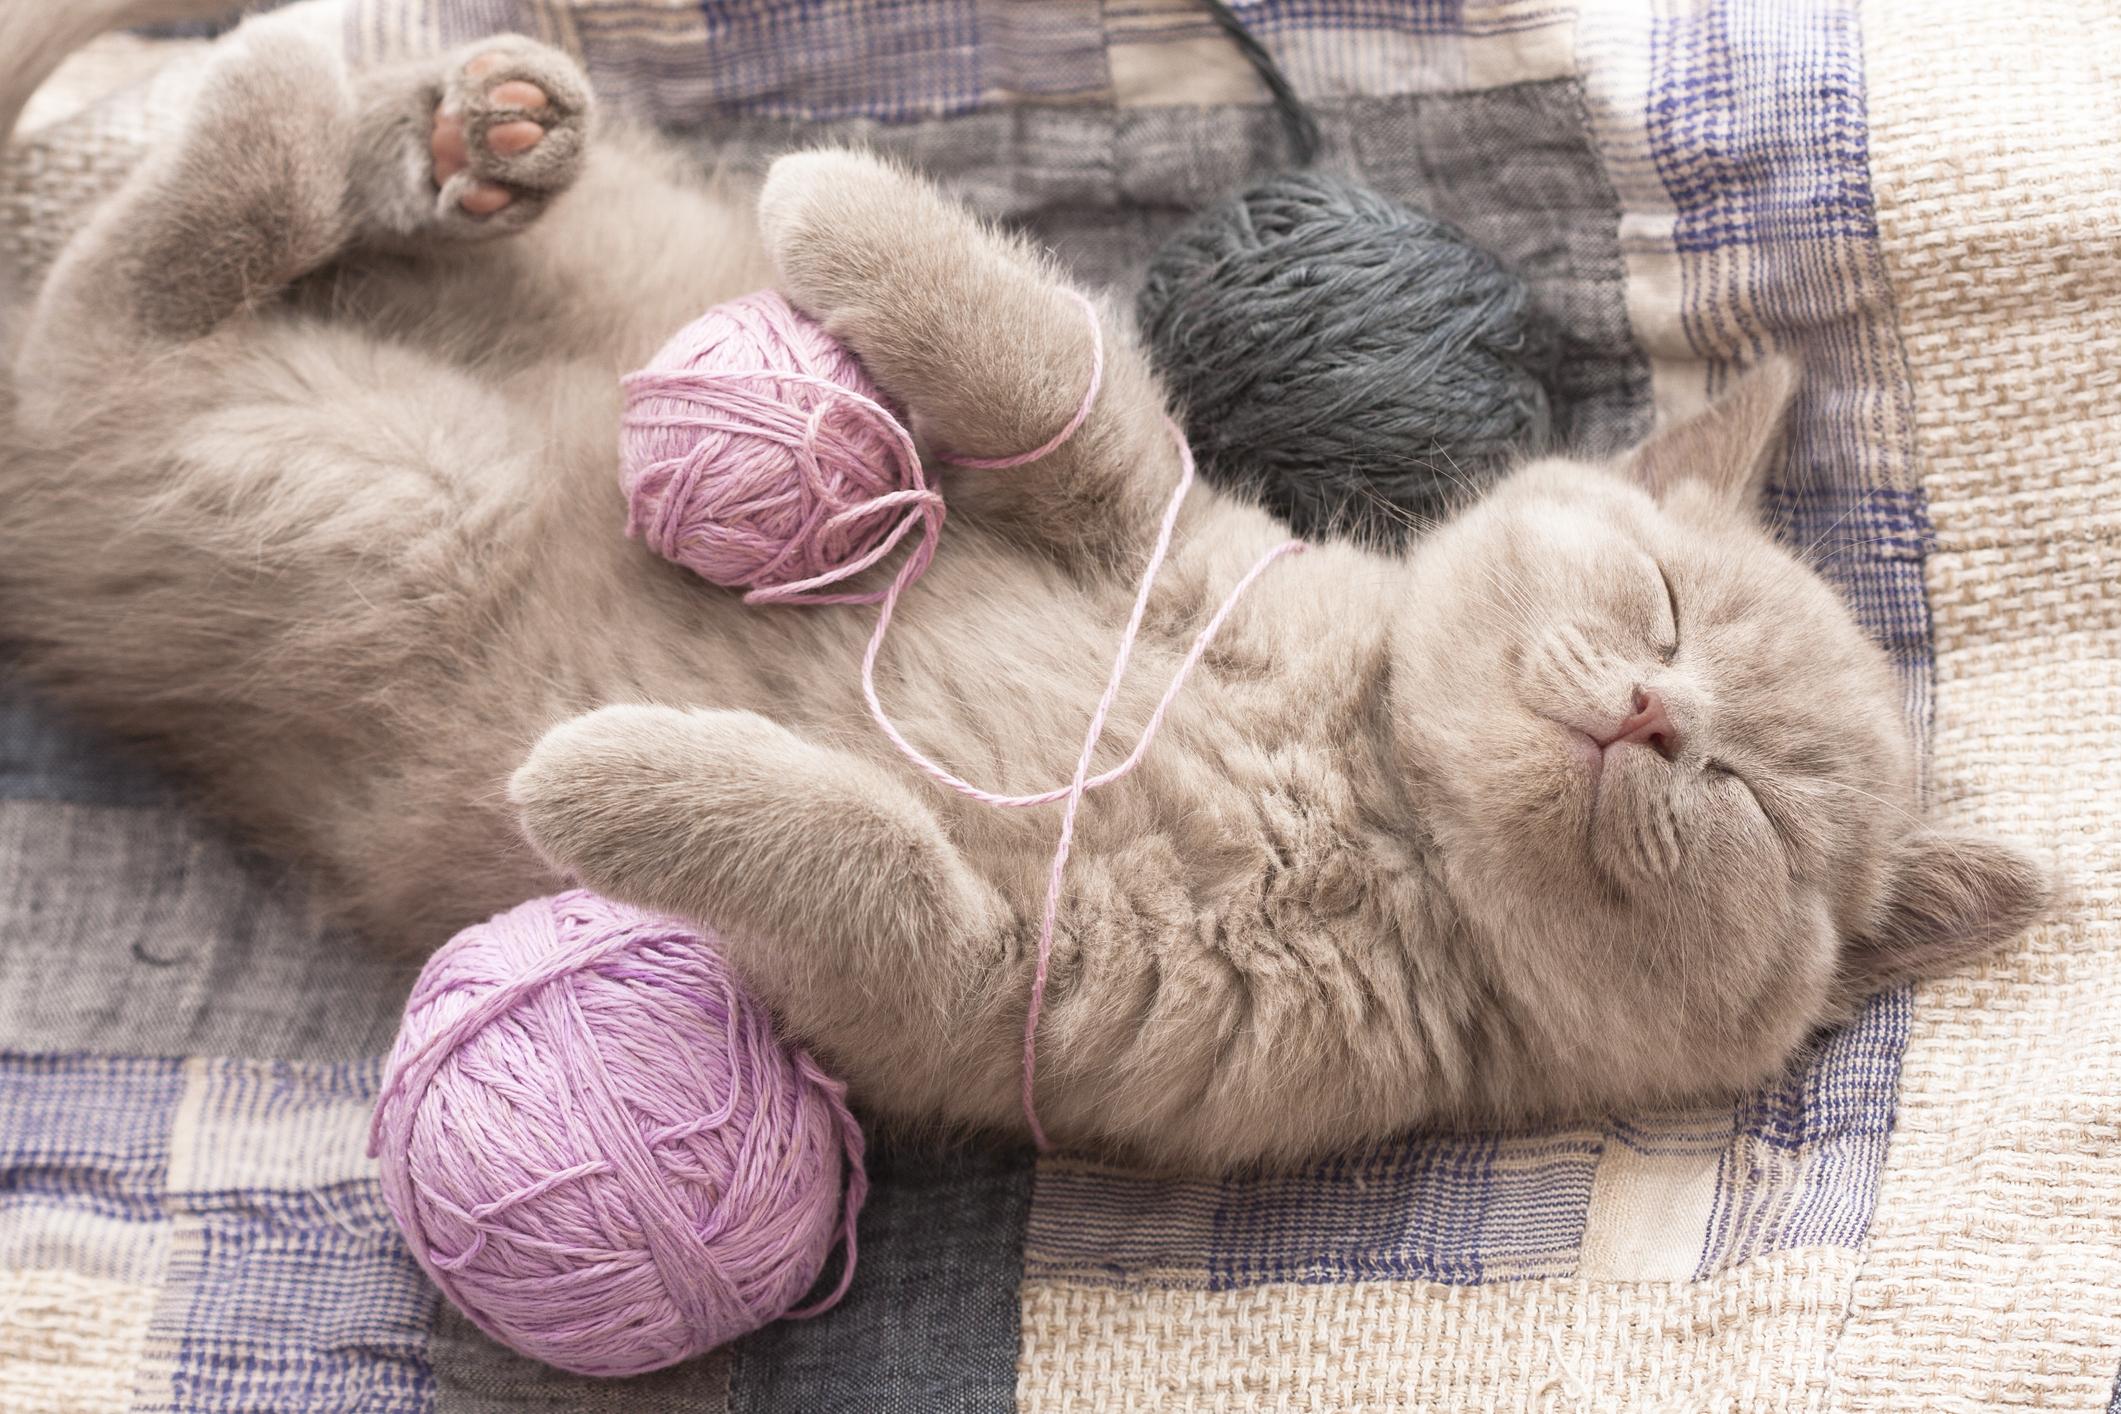 sleeping kitten with yarn wrapped around its torso